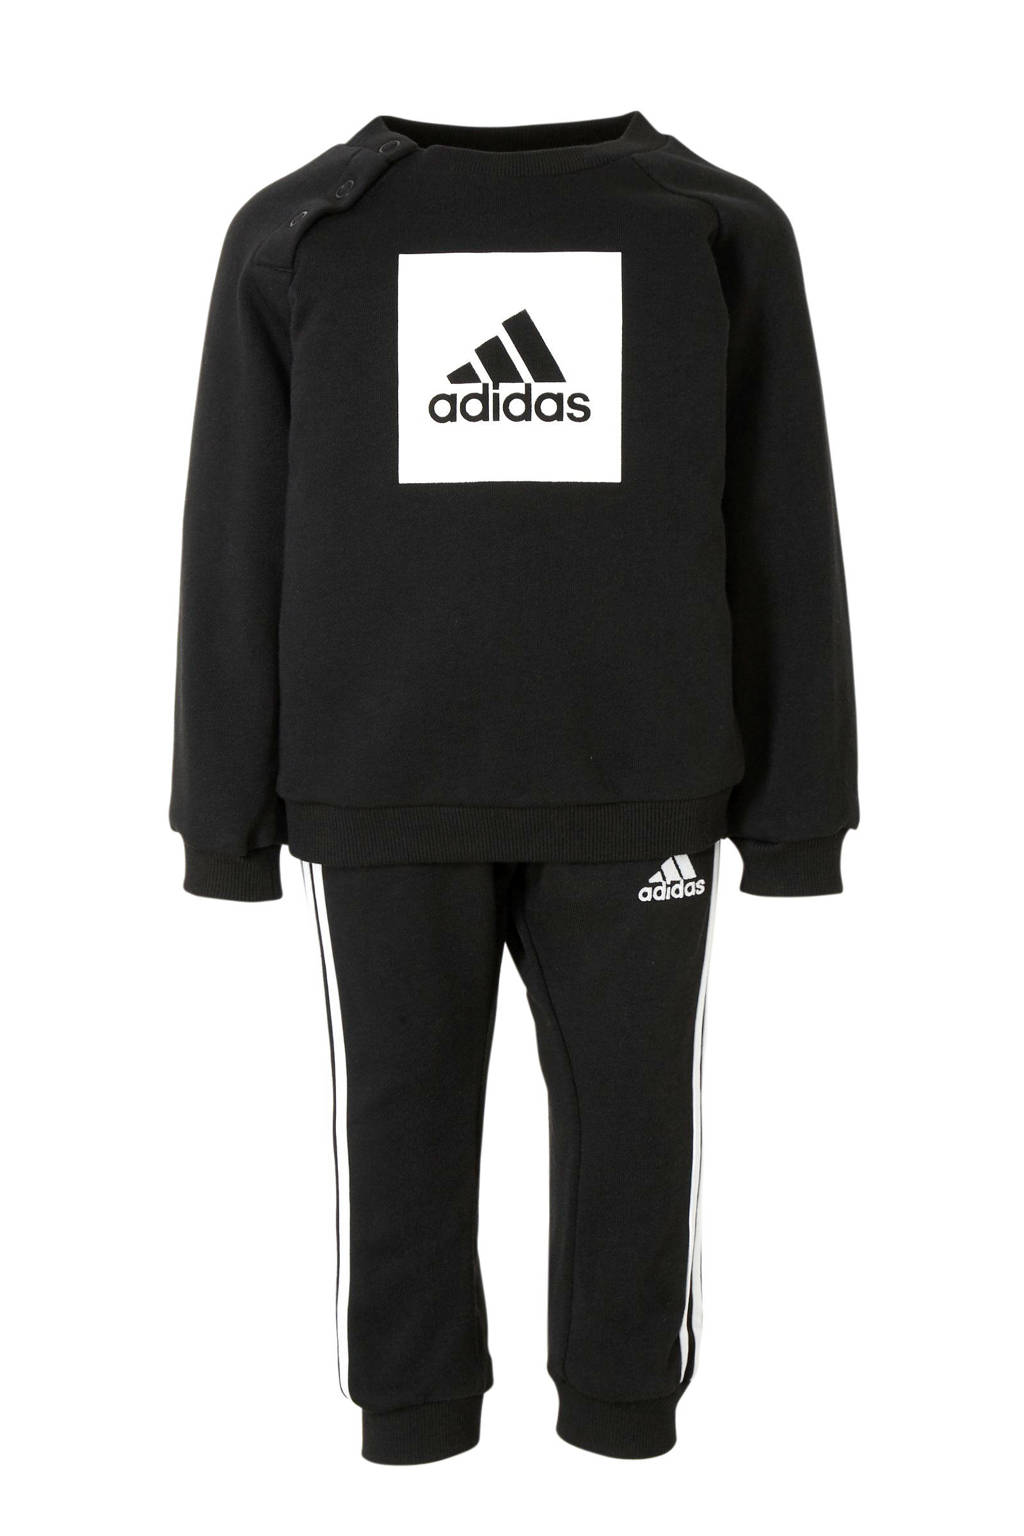 adidas   joggingpak zwart/wit, Zwart/wit